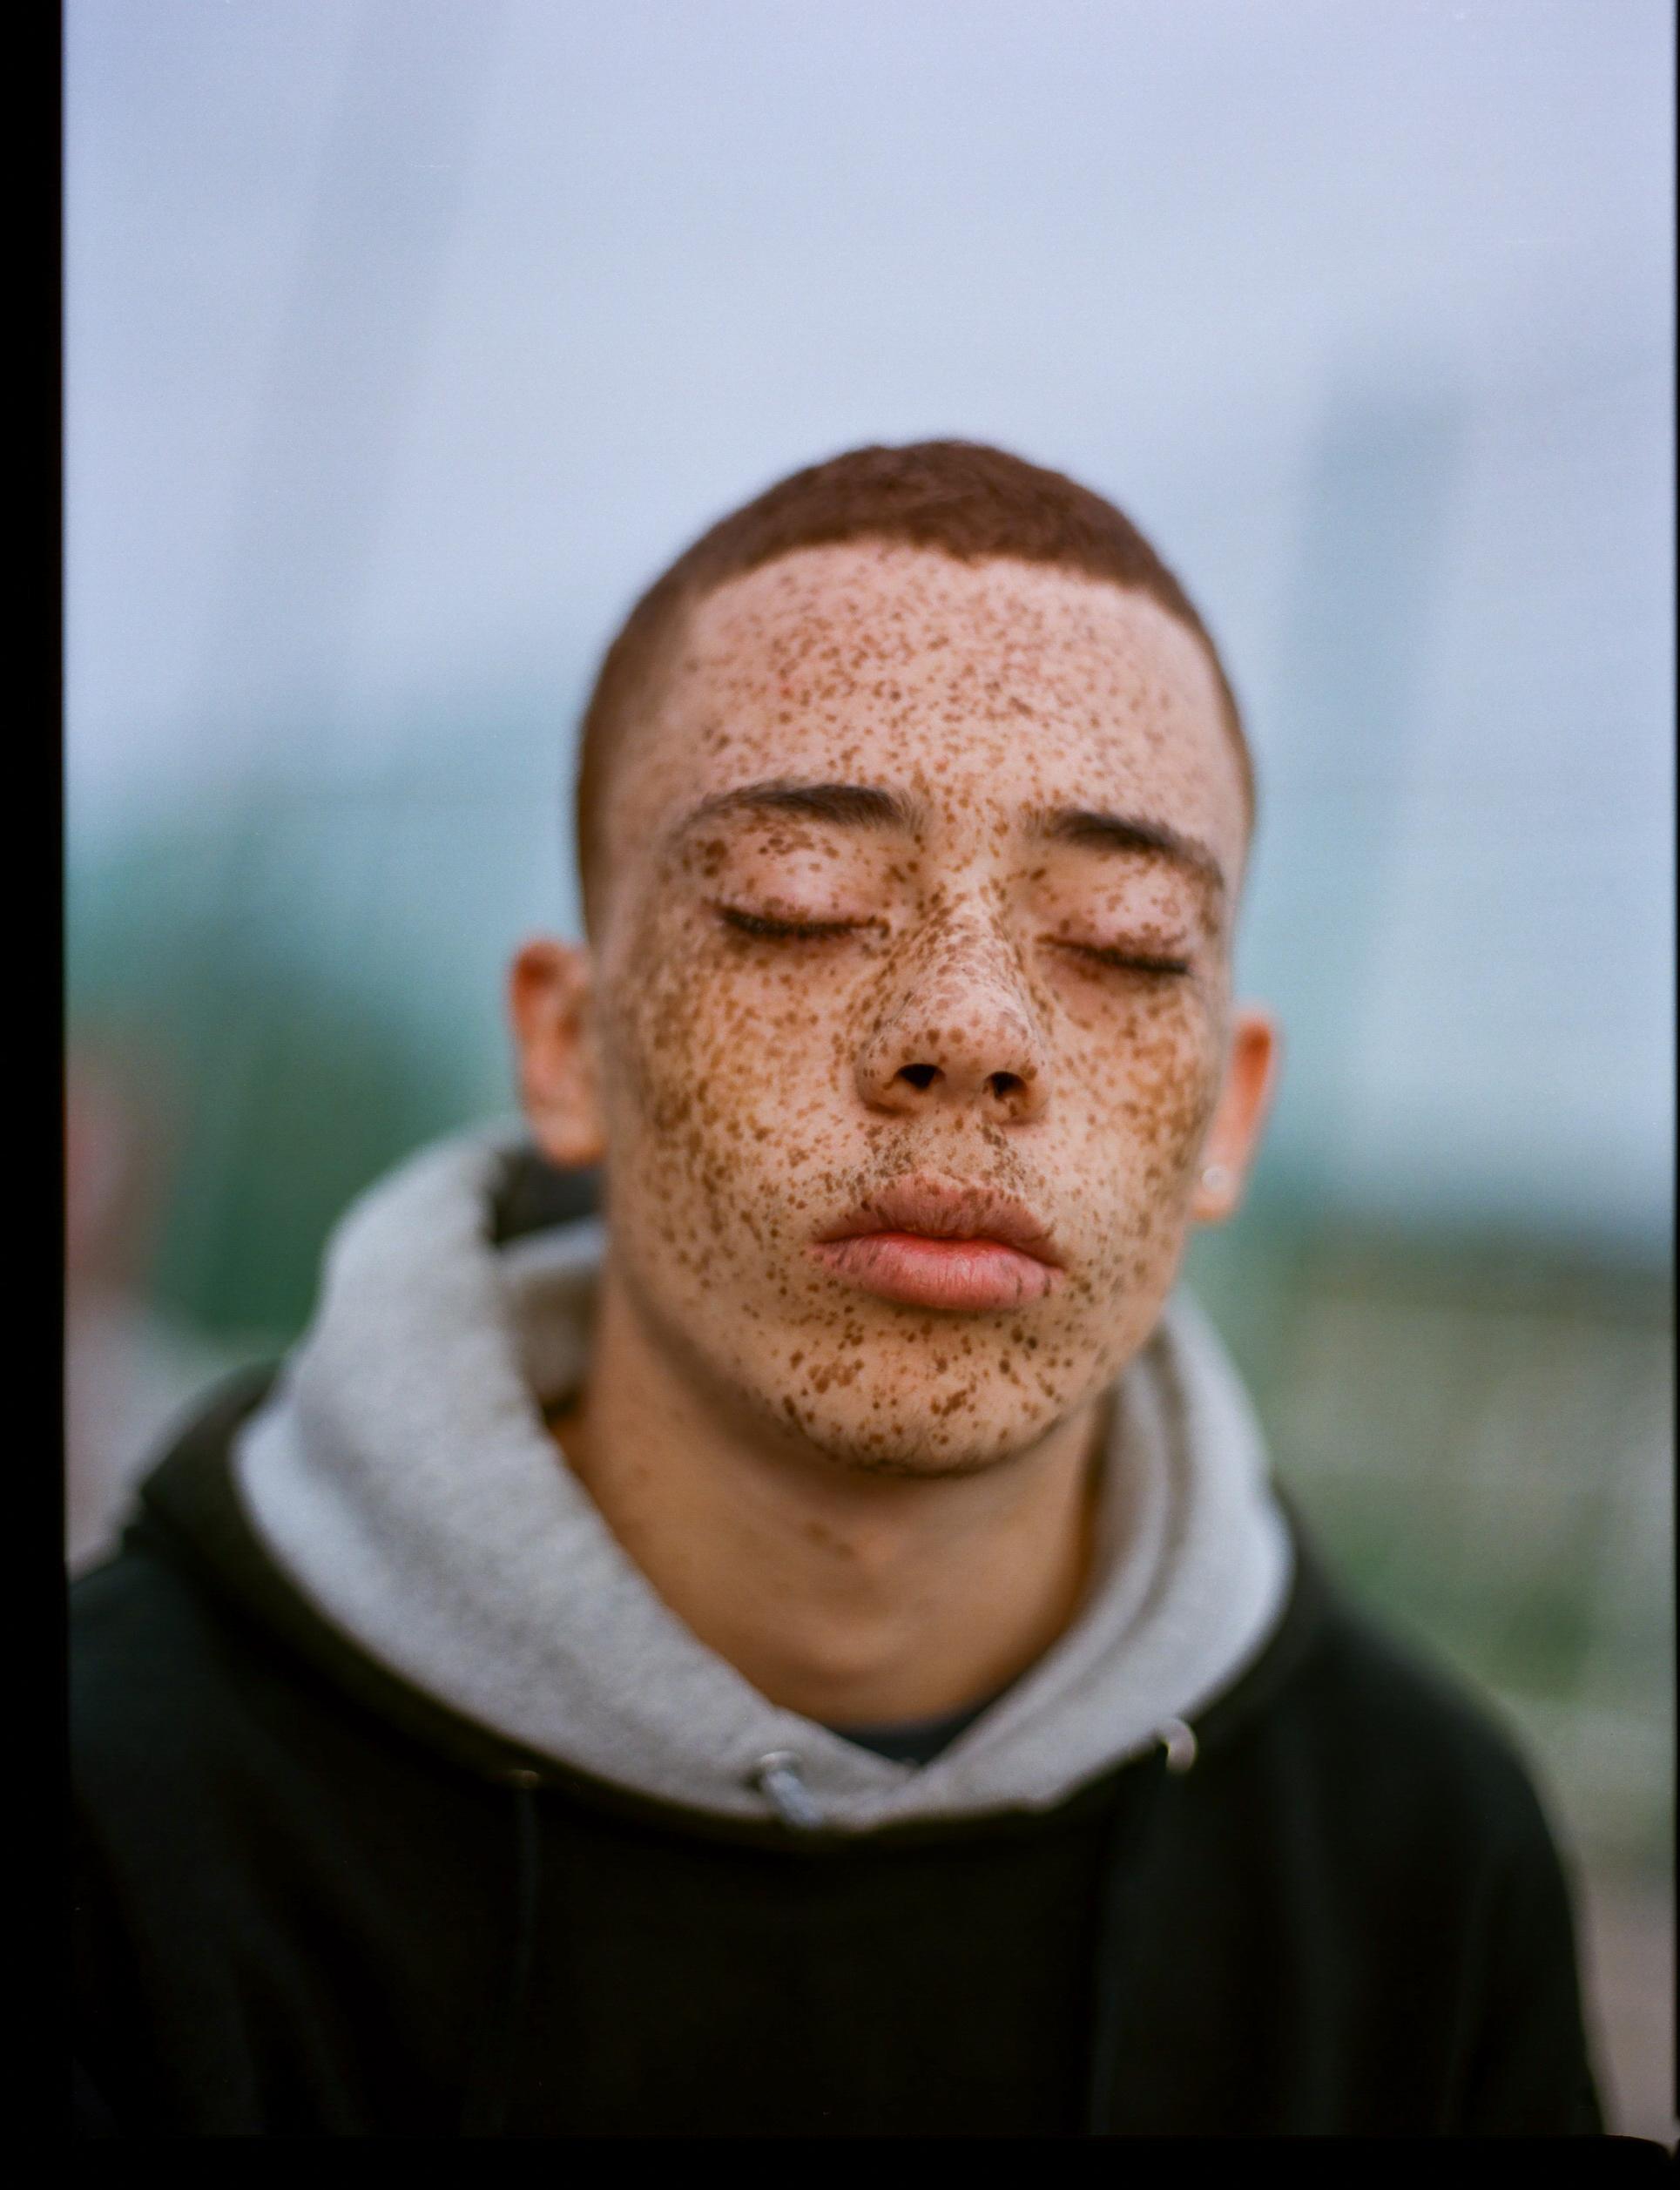 Model |Elliott Jay Brown